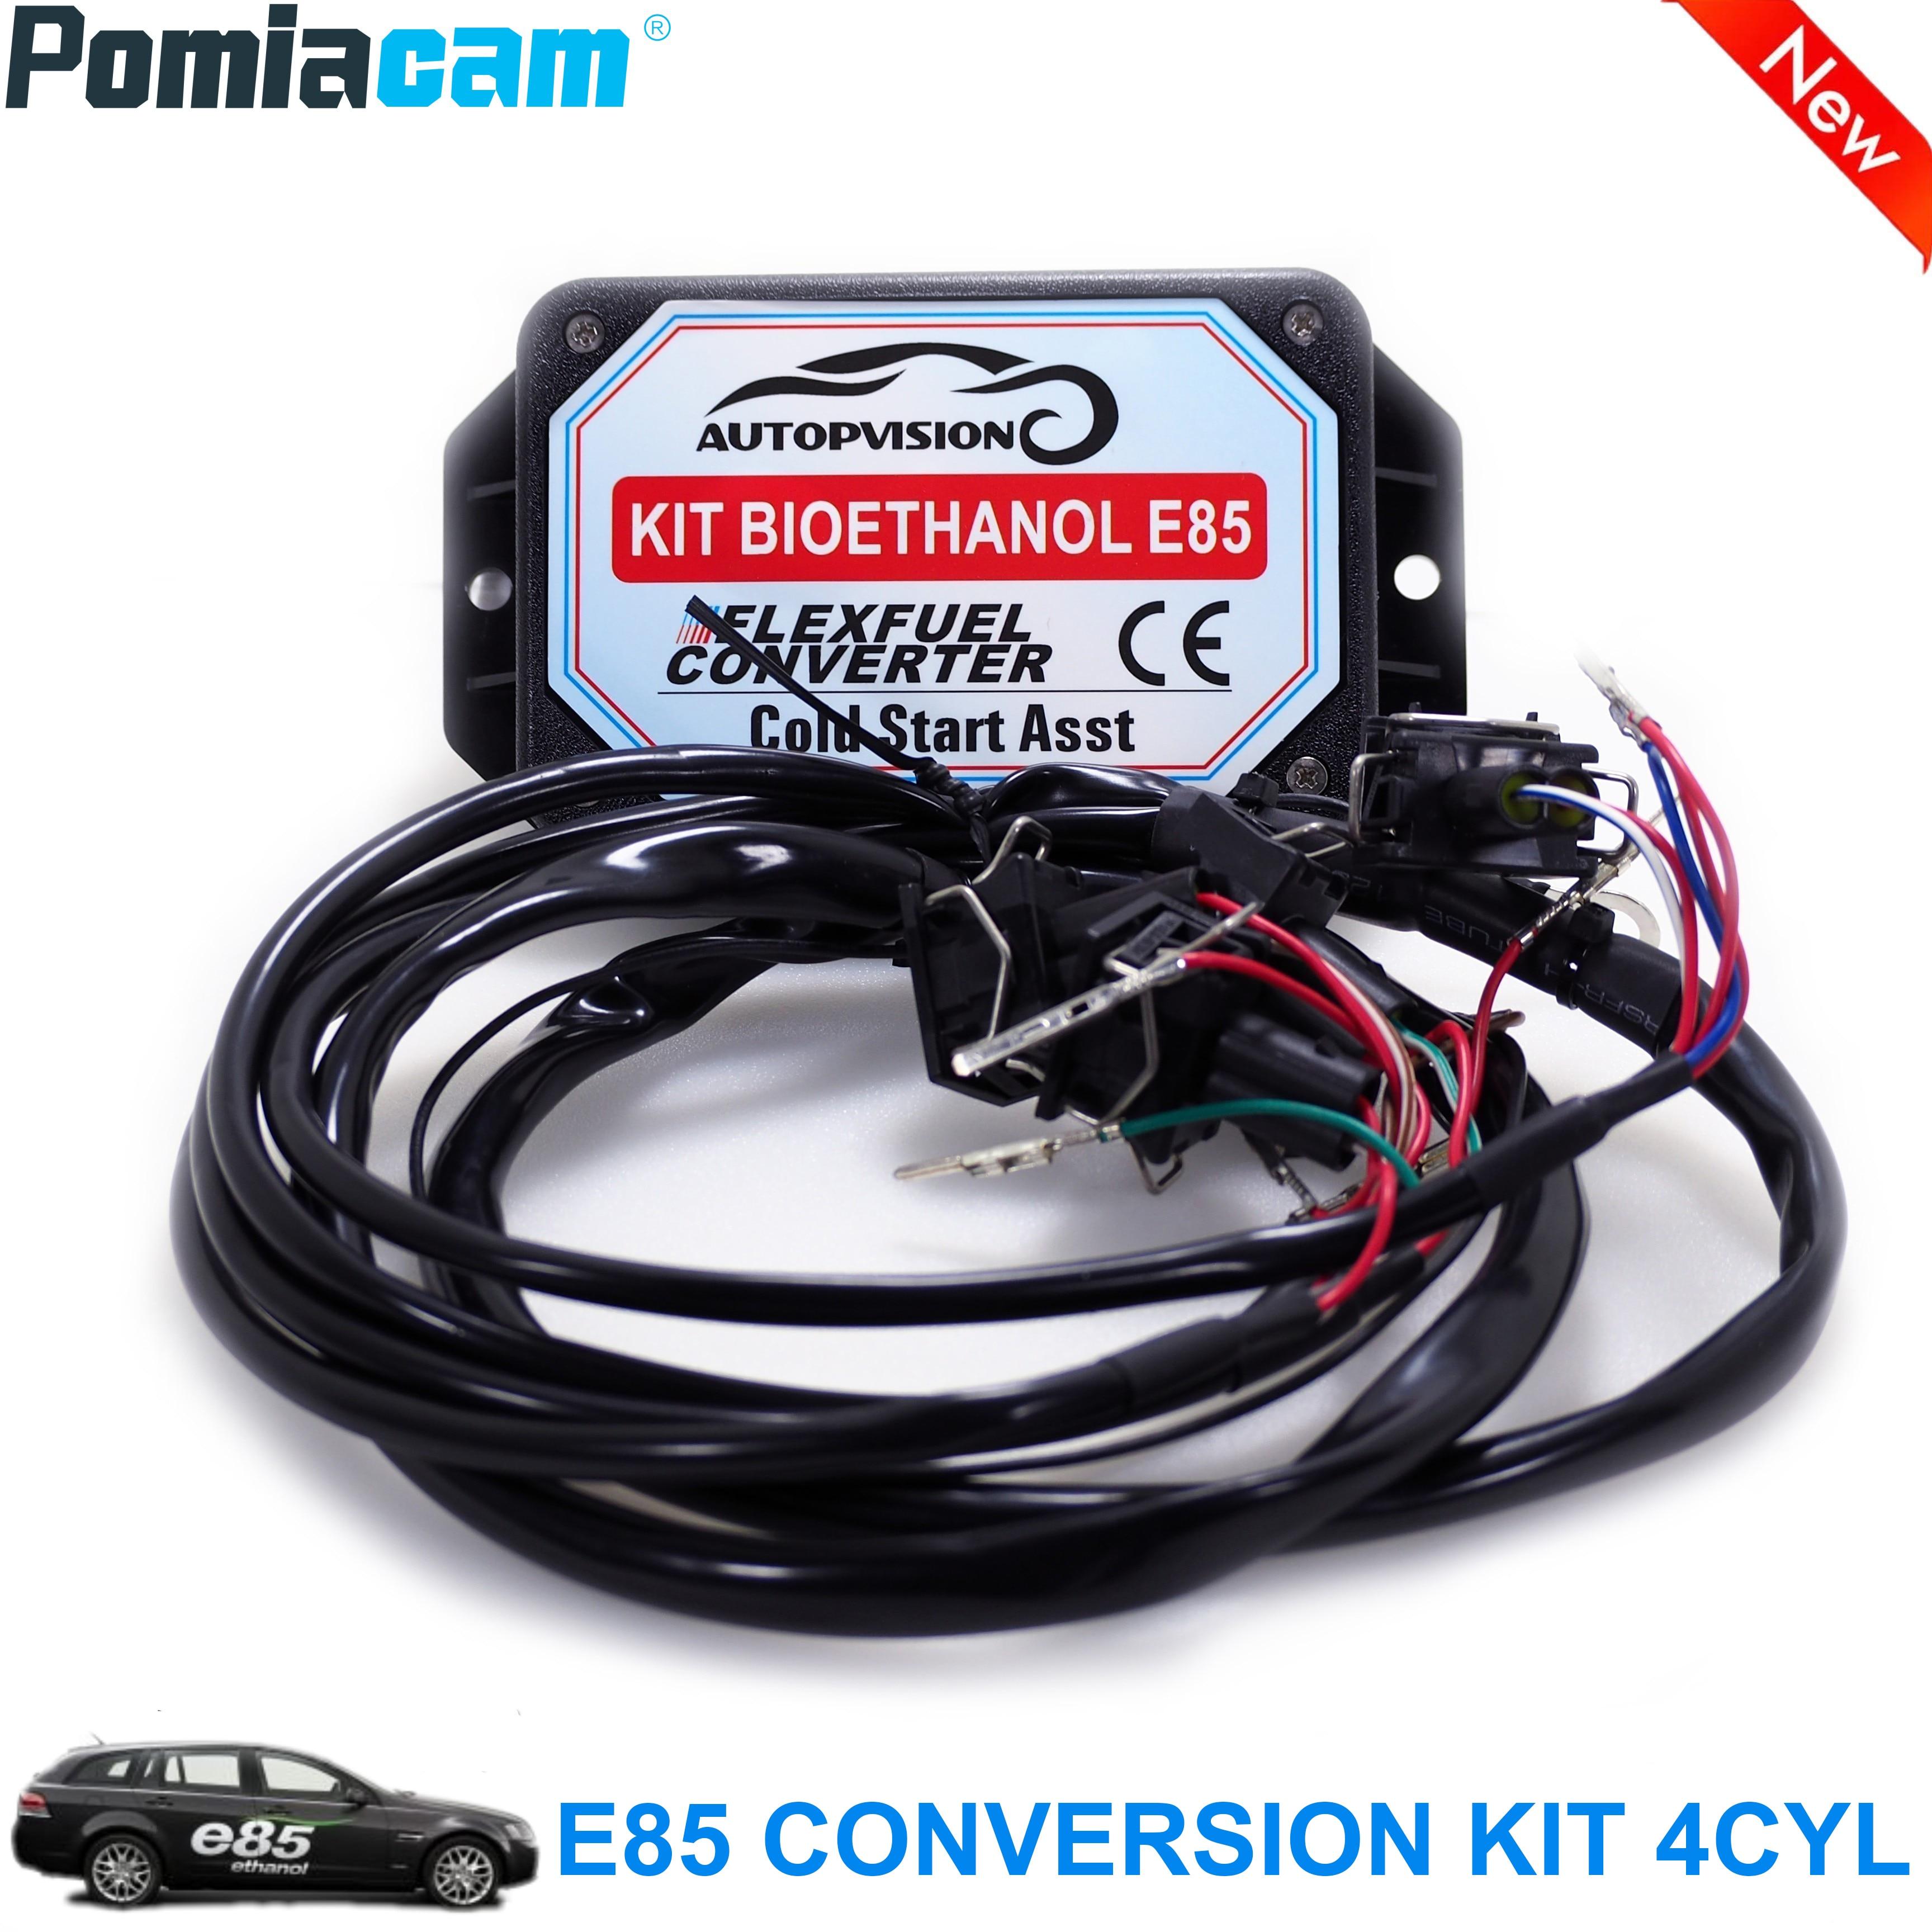 E85 4cyl bioethanol converter Auto conversion kit Flex Fuel ethanol alternative with Cold Start Asst. biofuel e85  ethanol car|Transmission & Cables| |  - title=